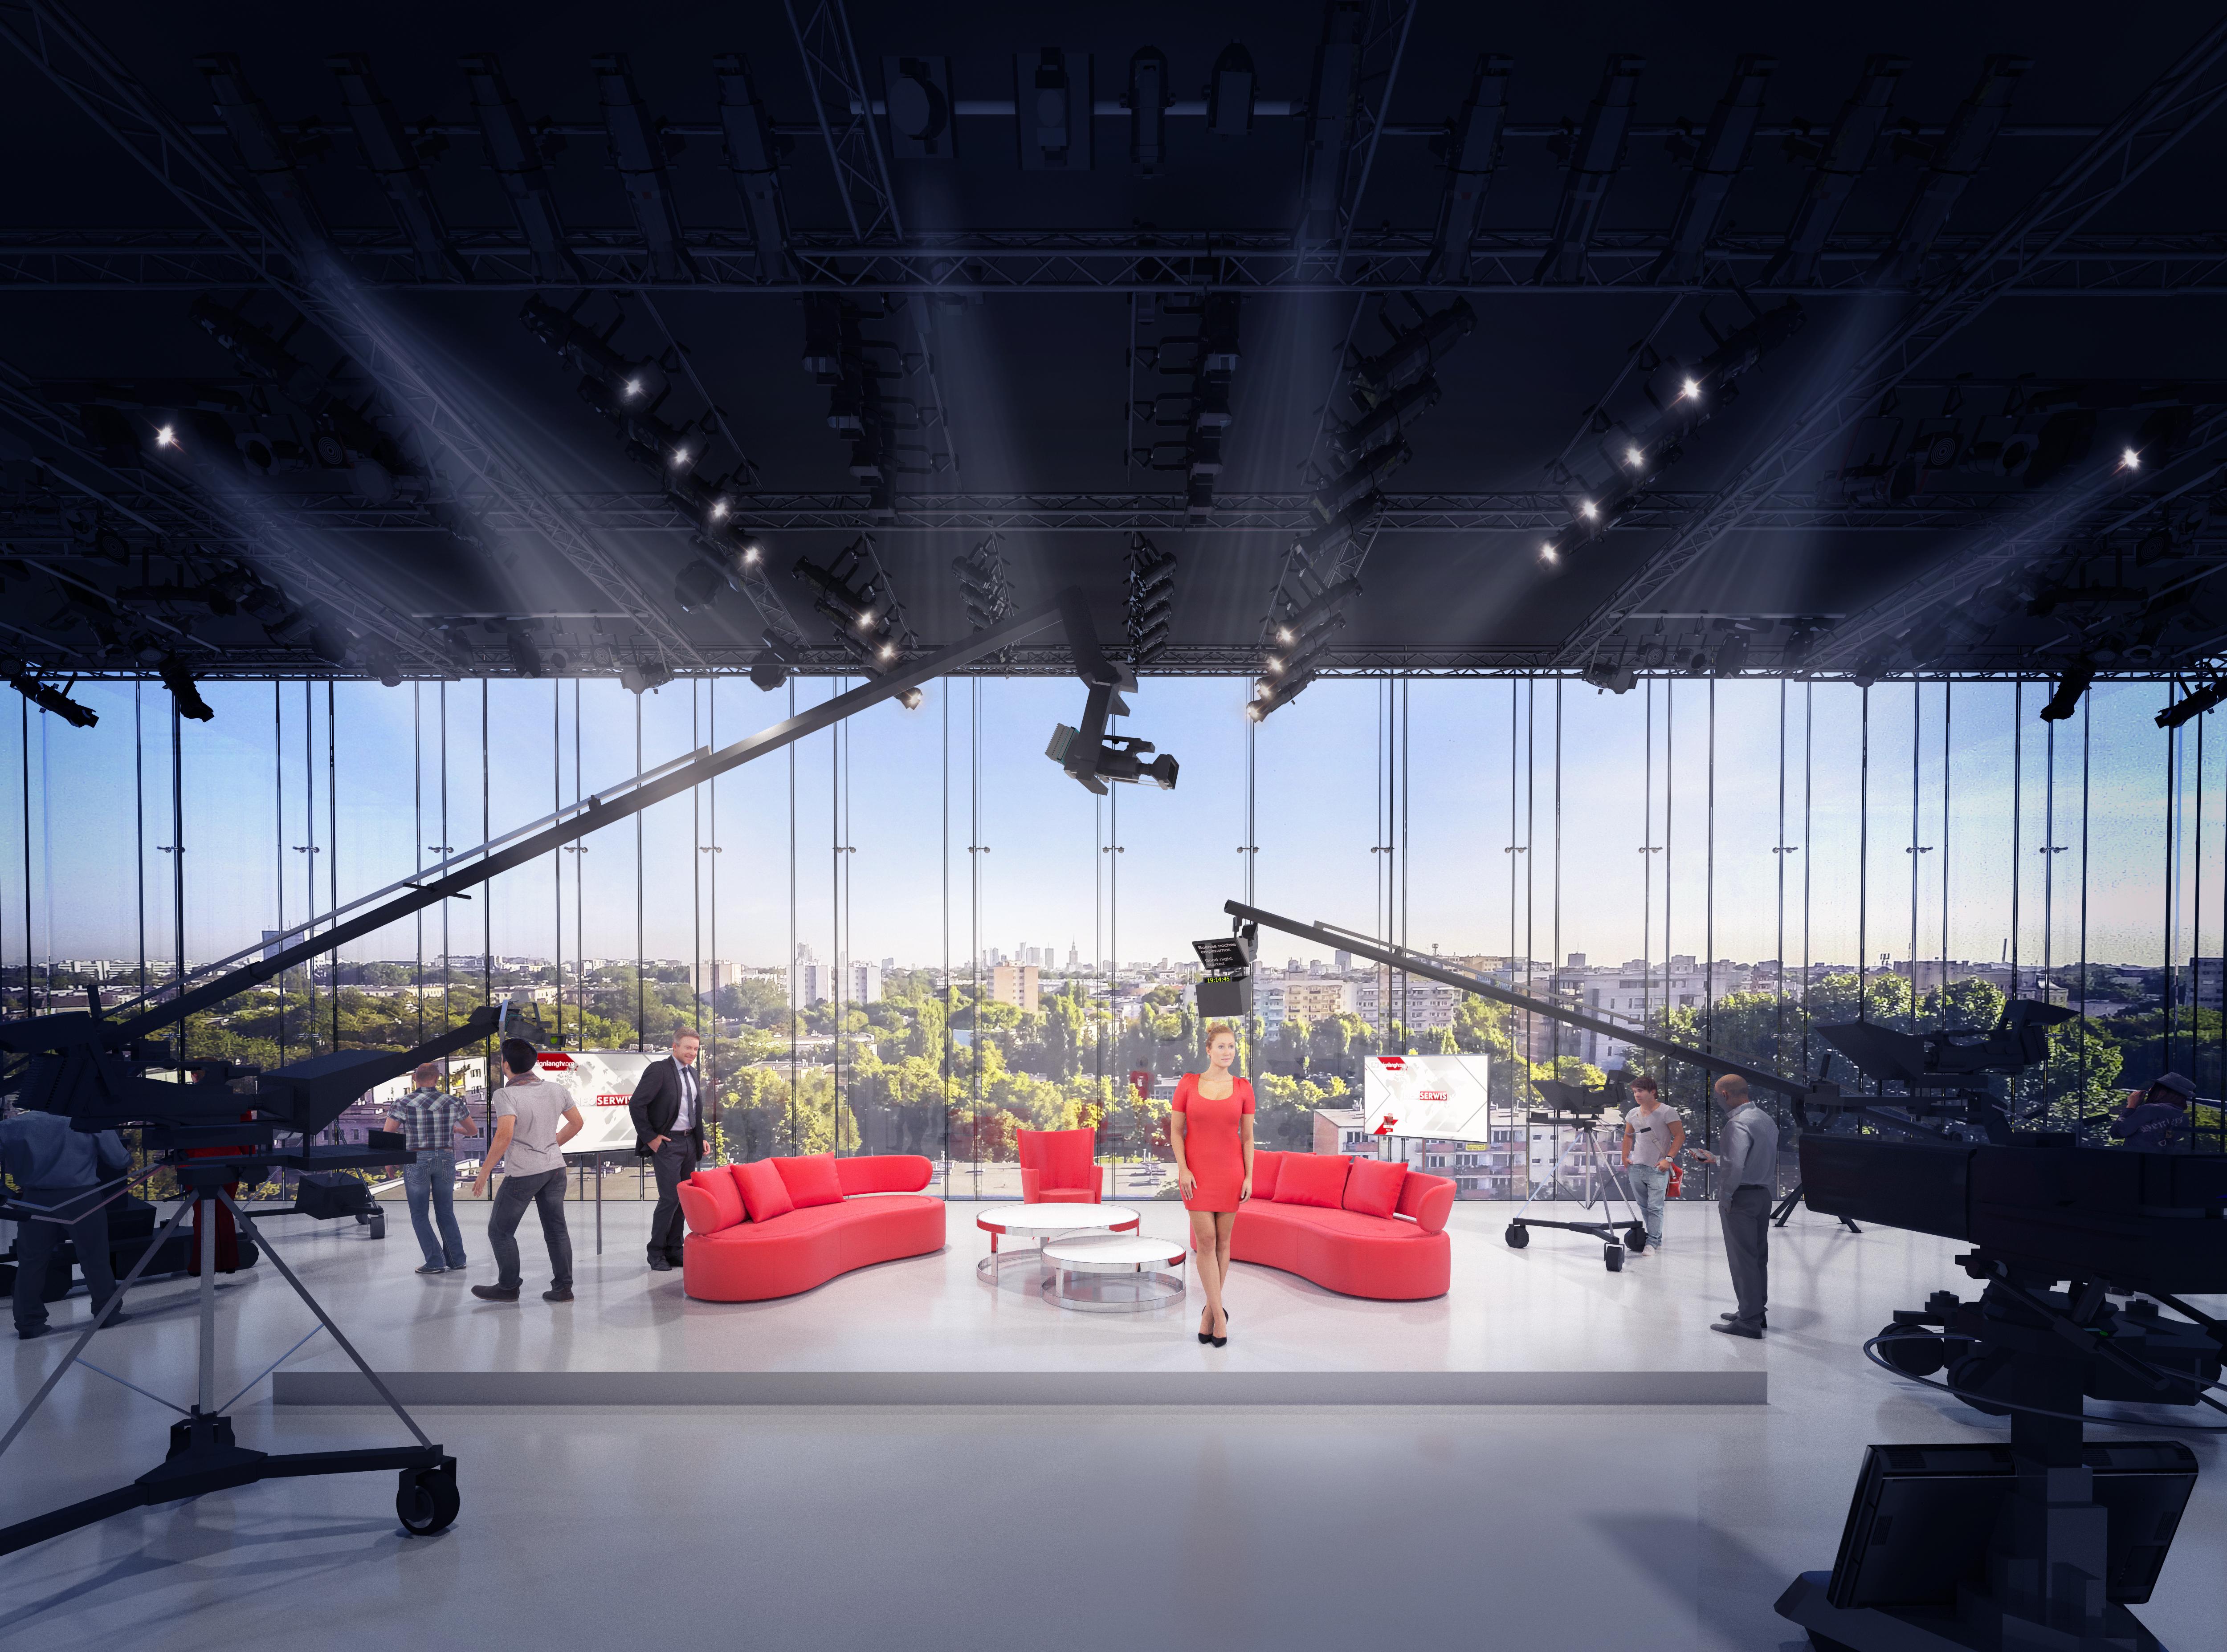 TVP - Warsaw